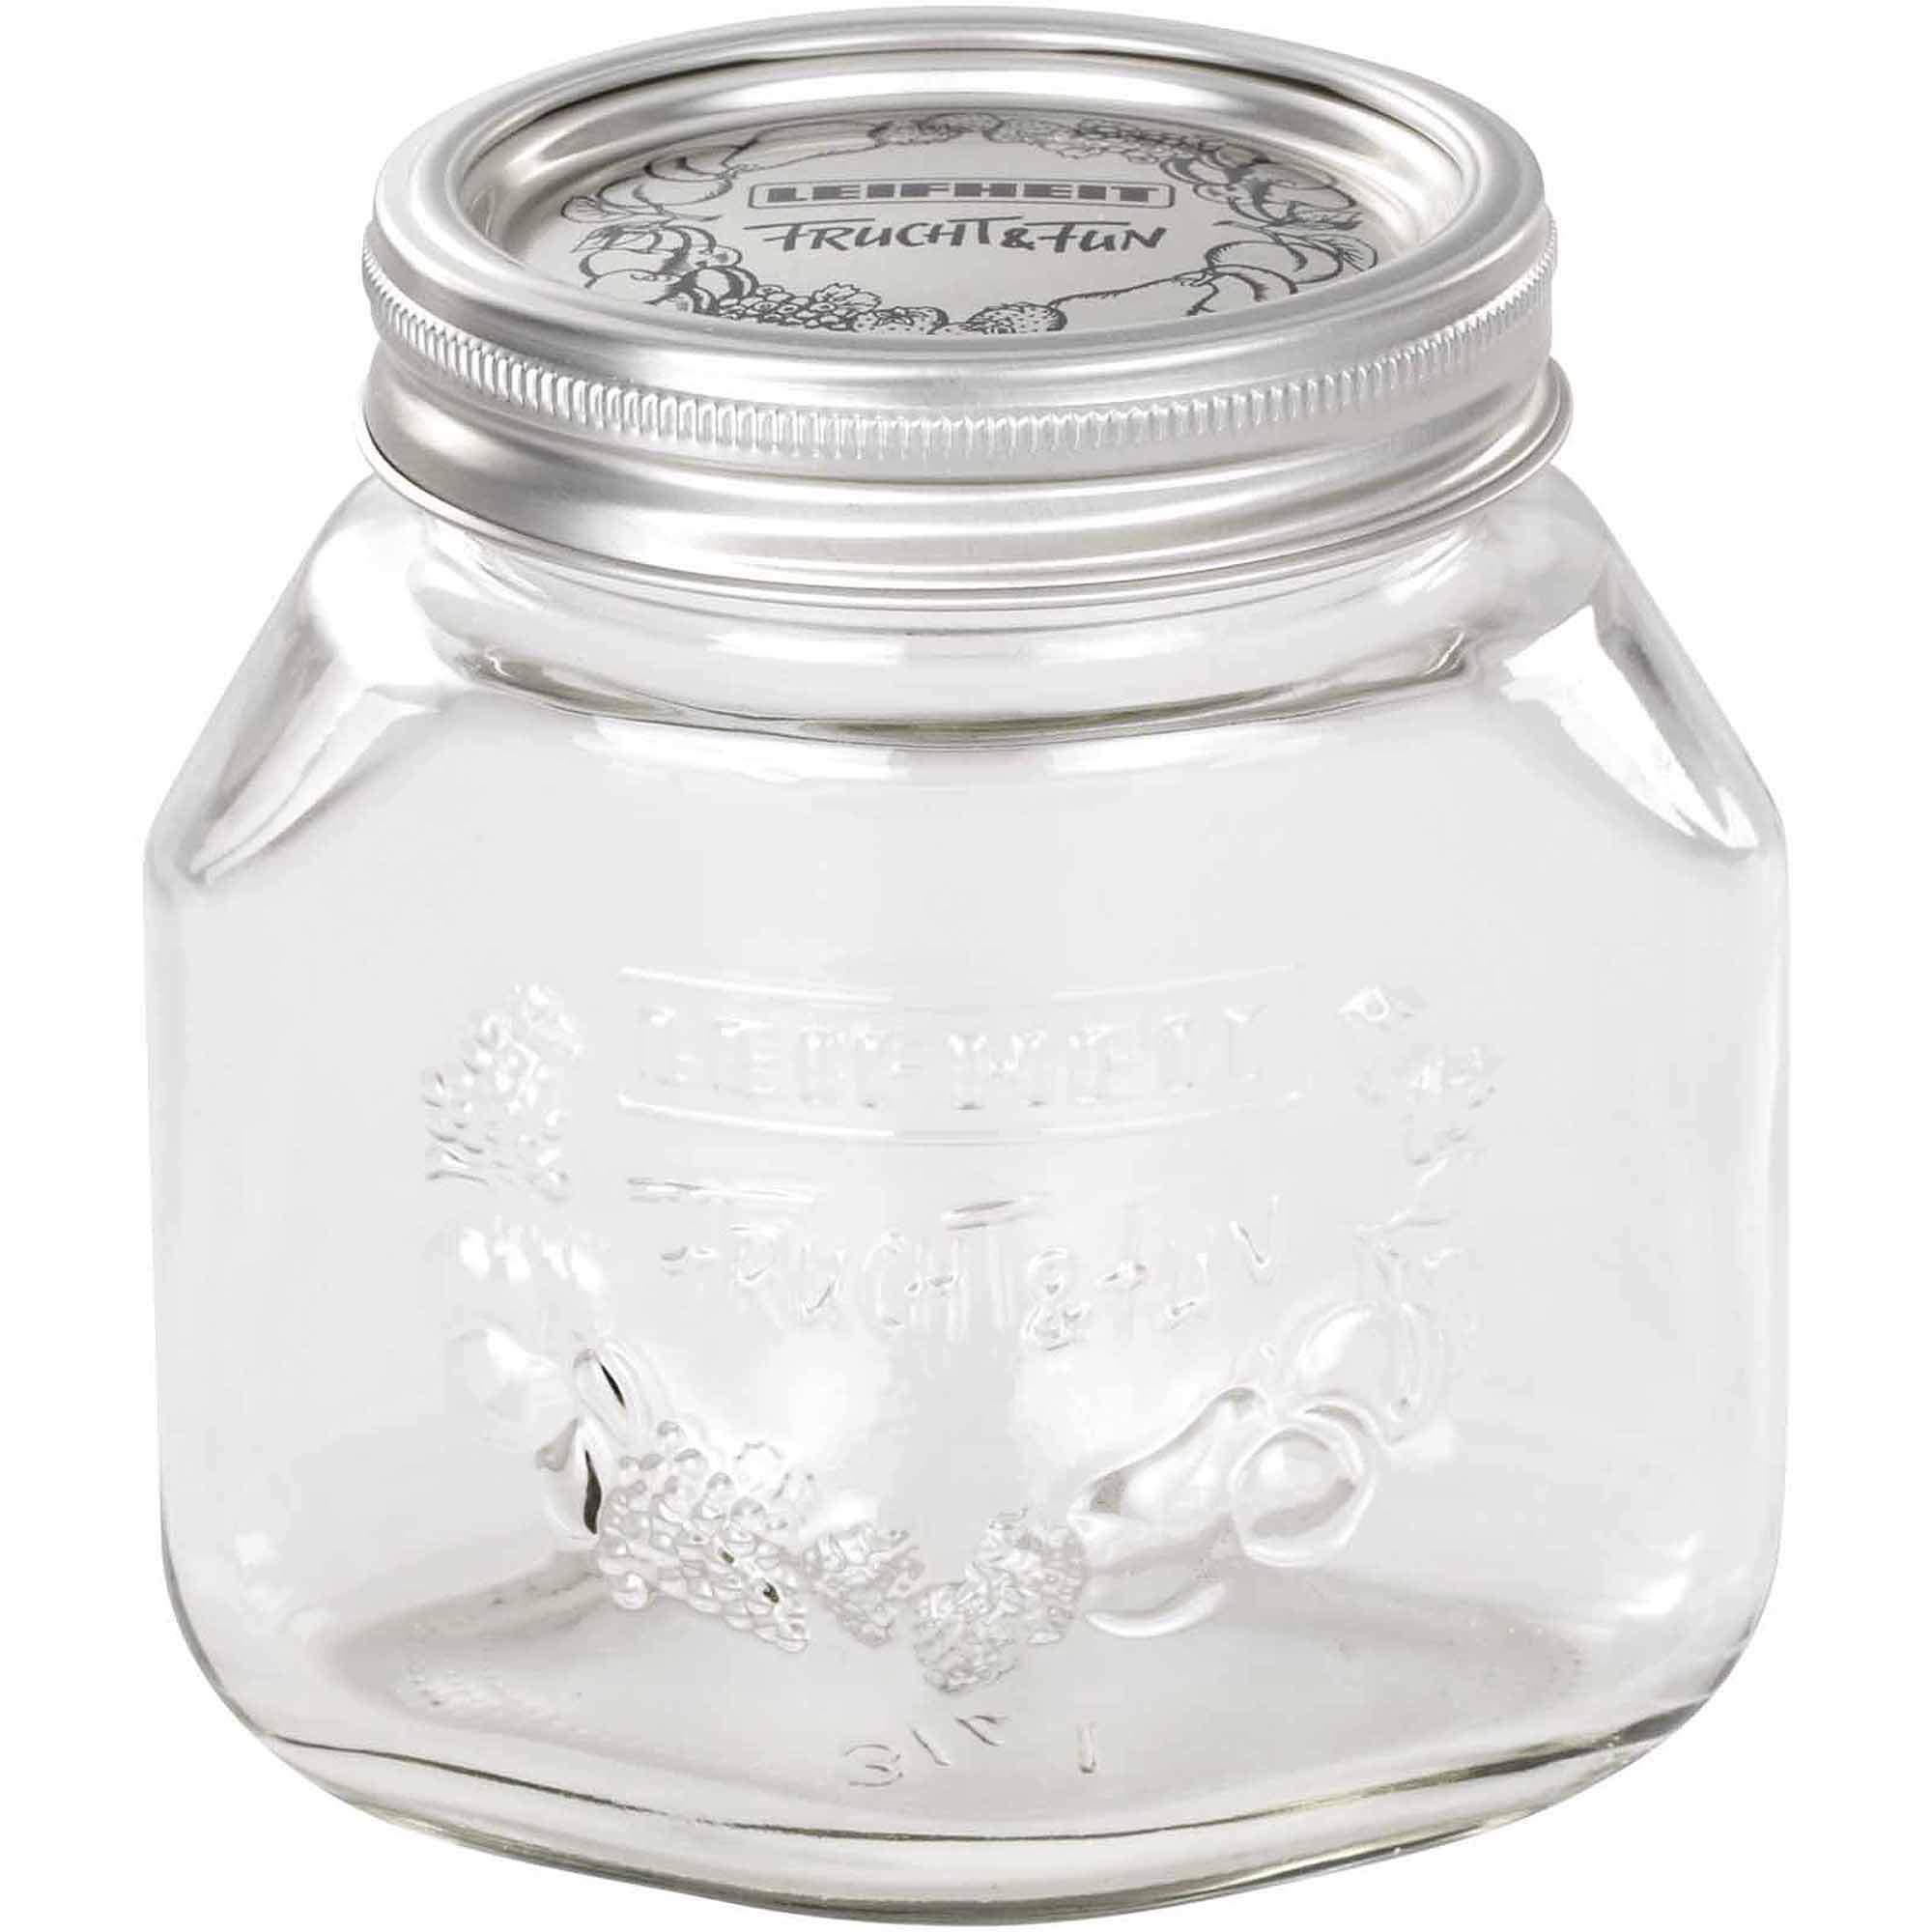 Leifheit Medium 25 oz Glass Wide-Mouth Mason Jar for Canning Set of 6 Transparent - Walmart.com  sc 1 st  Walmart & Leifheit Medium 25 oz Glass Wide-Mouth Mason Jar for Canning Set of ...